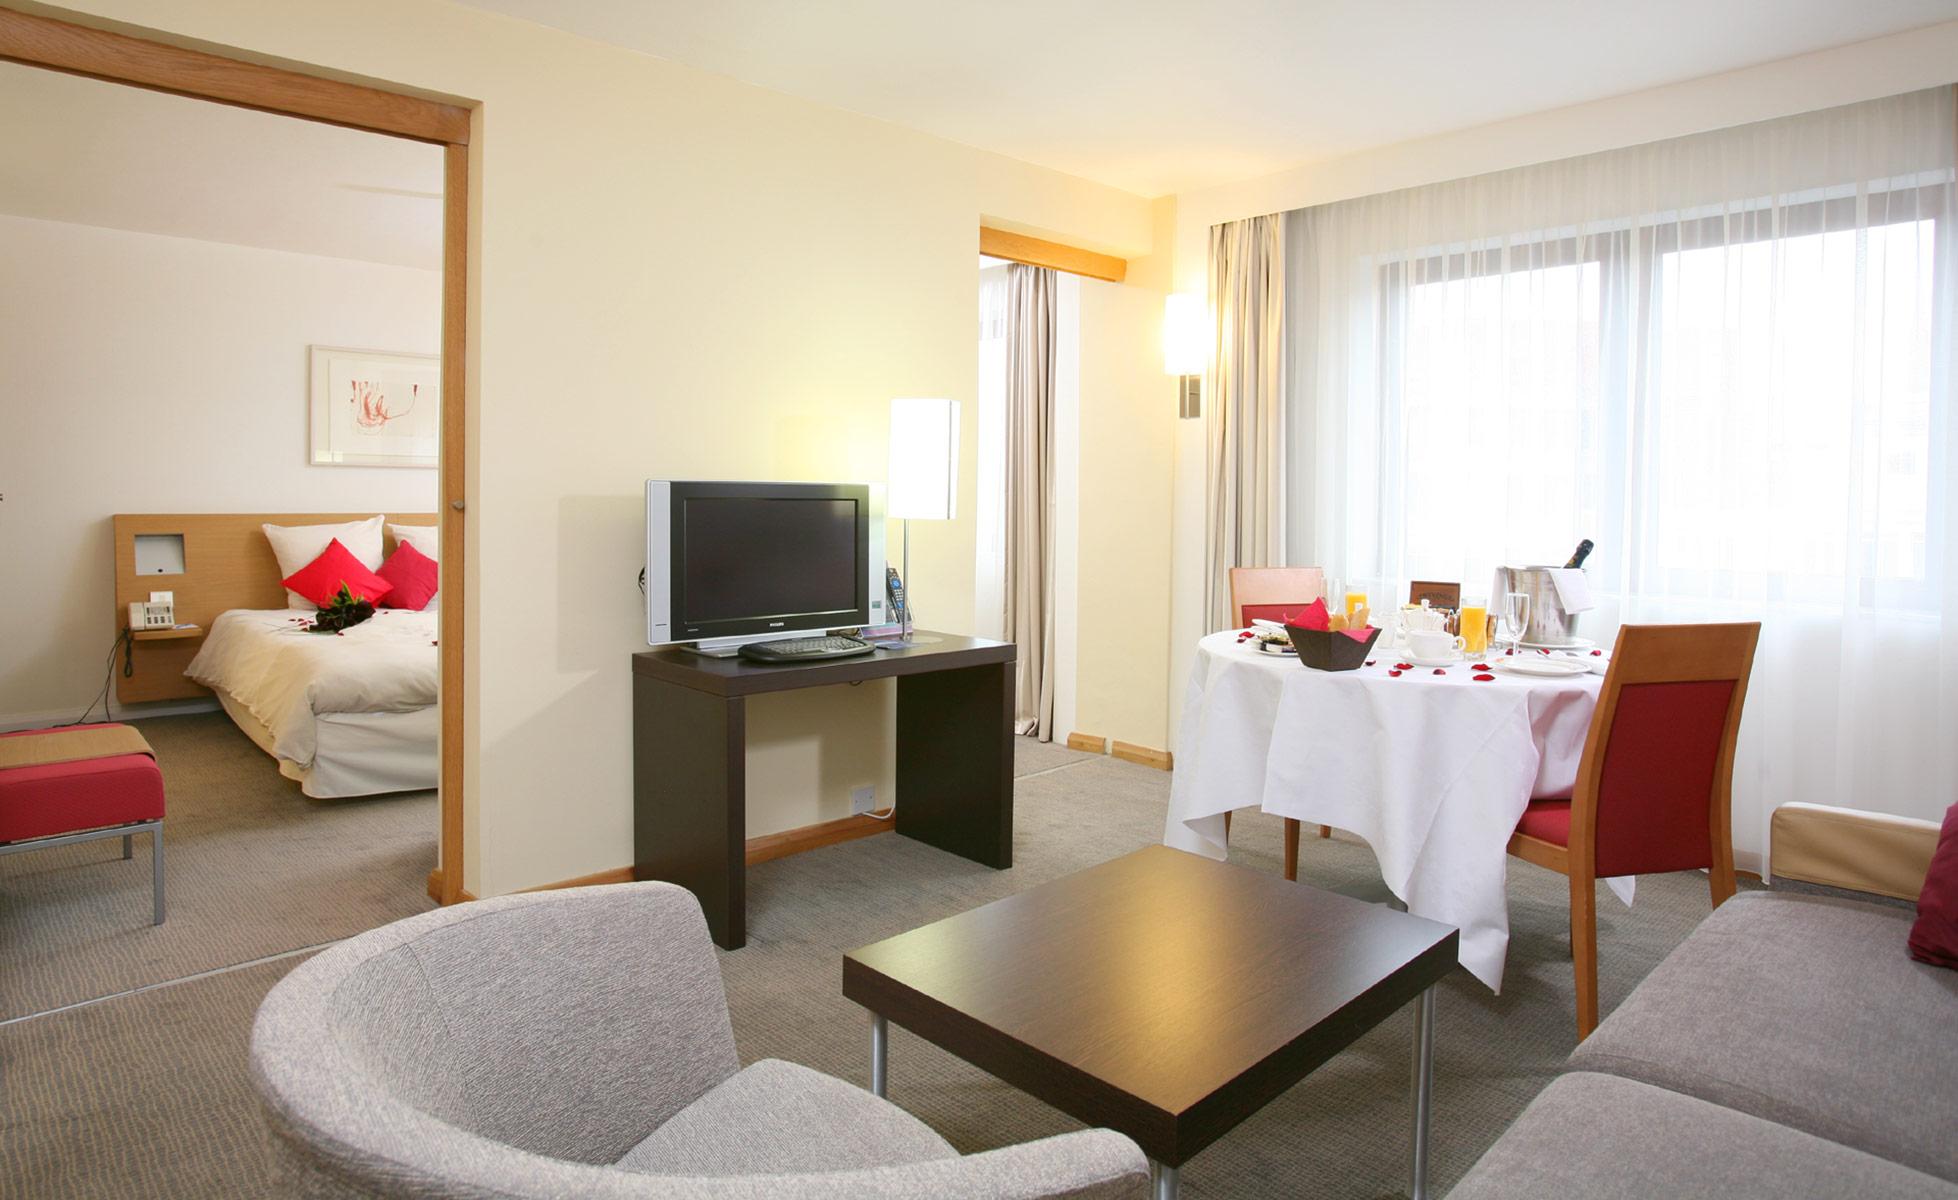 Novotel bedroom Suite / Accor Hotels